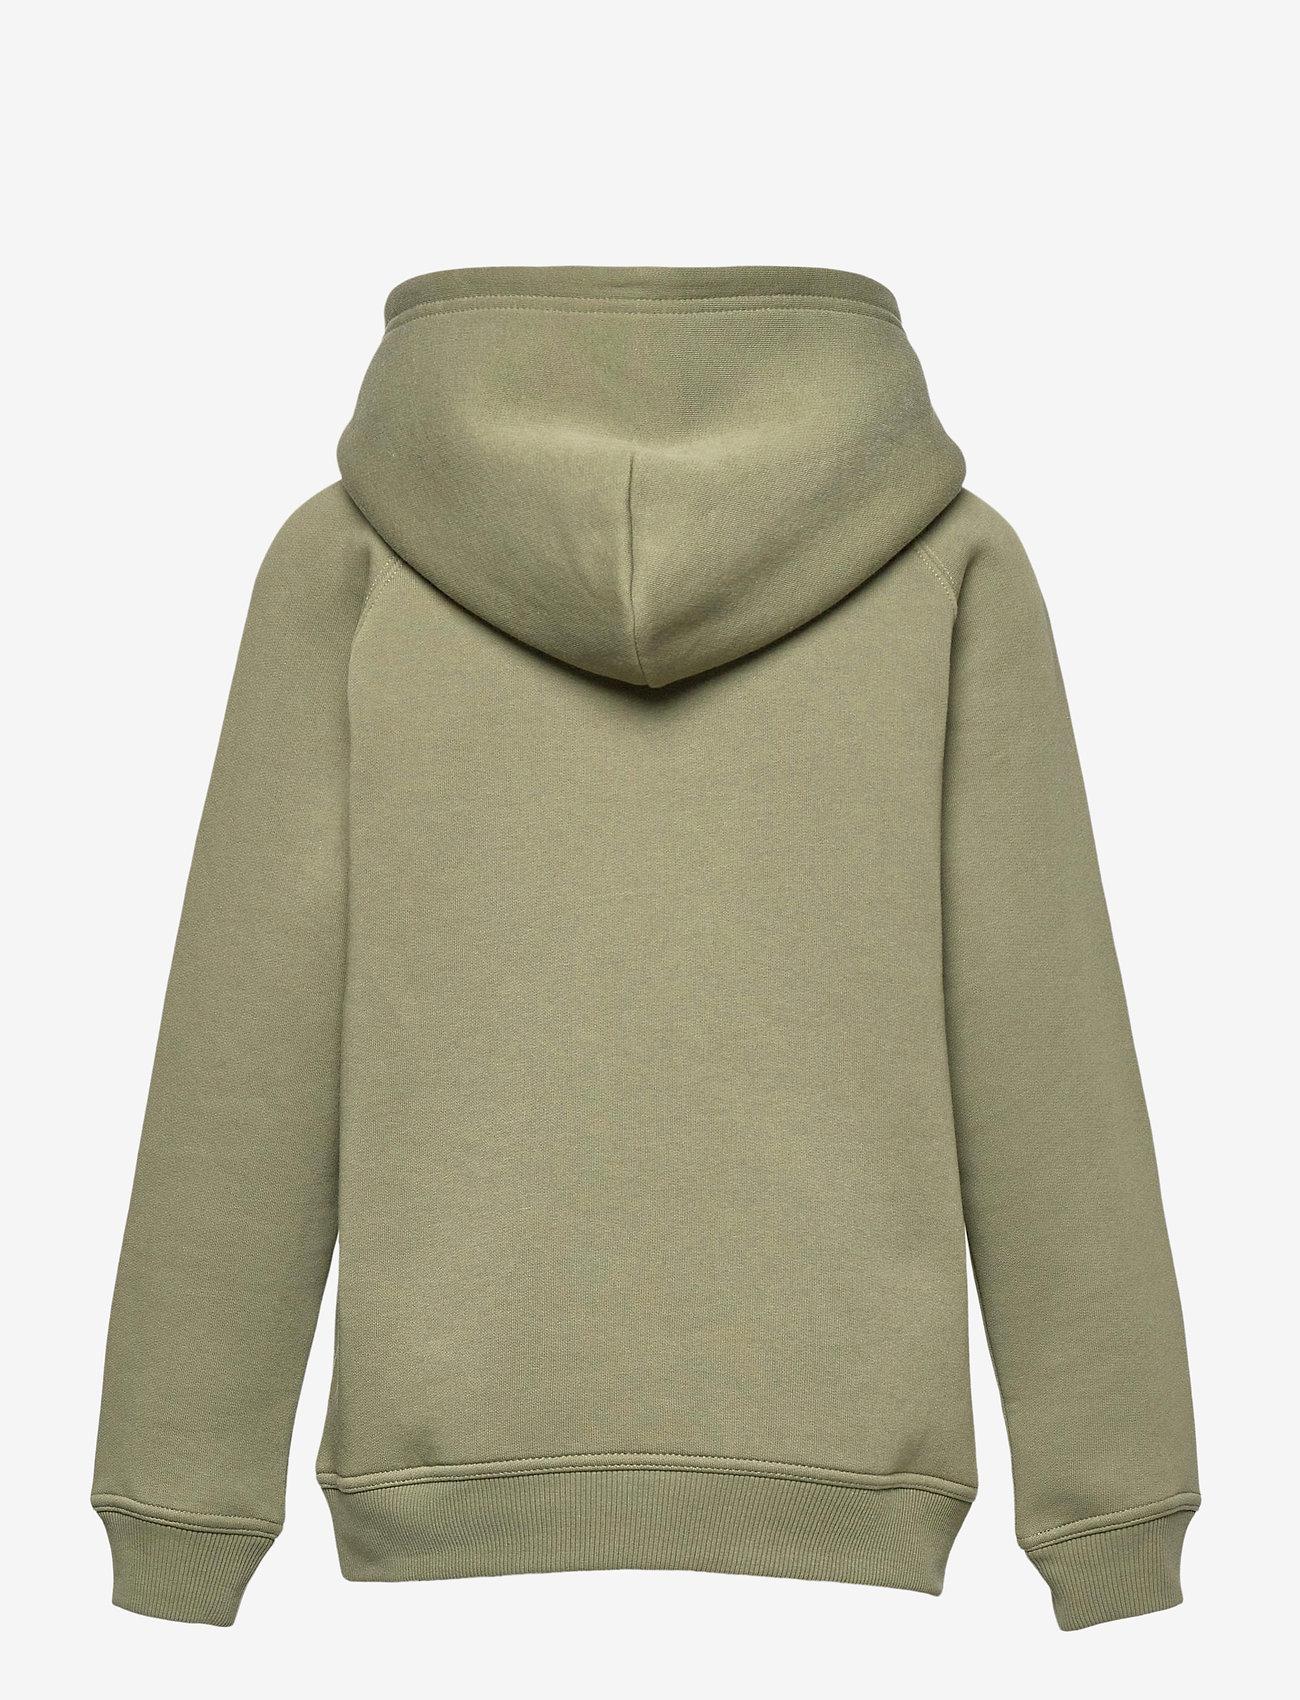 GANT - ARCHIVE SHIELD HOODIE - hoodies - four leaf clover - 1